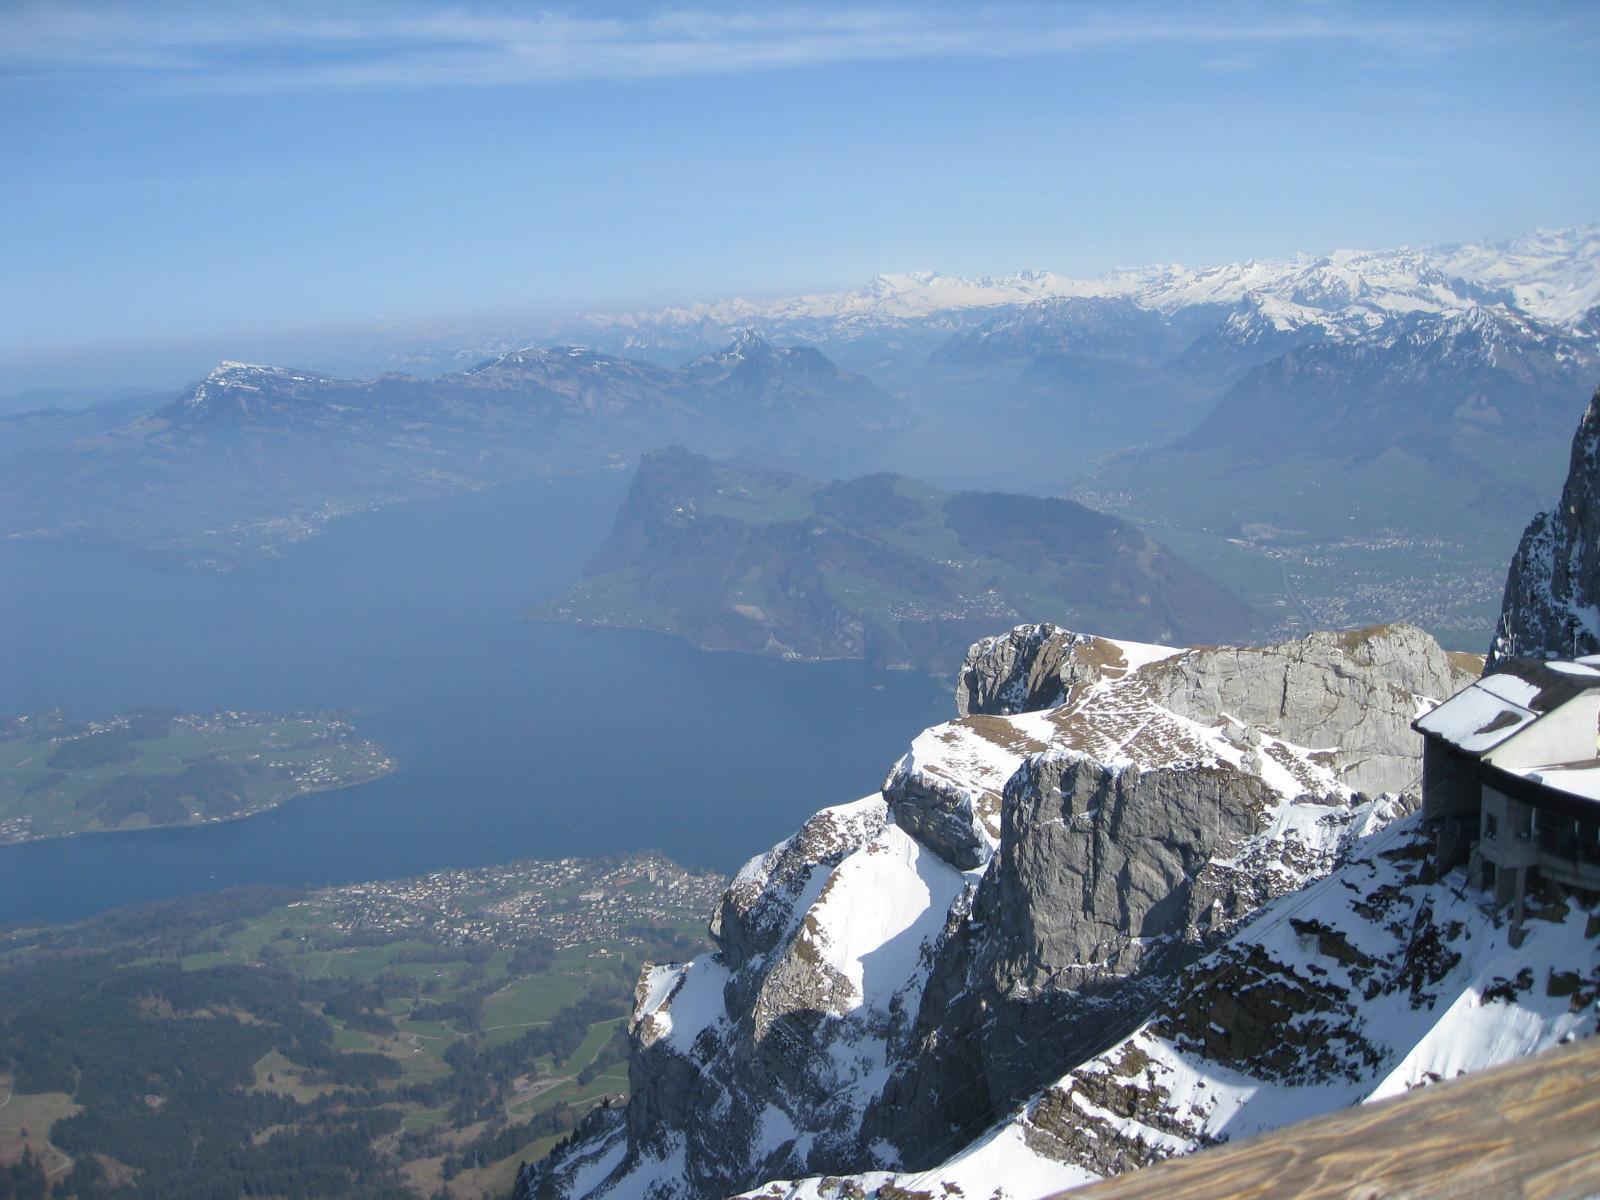 Mountain top in Lucerne, Switzerland